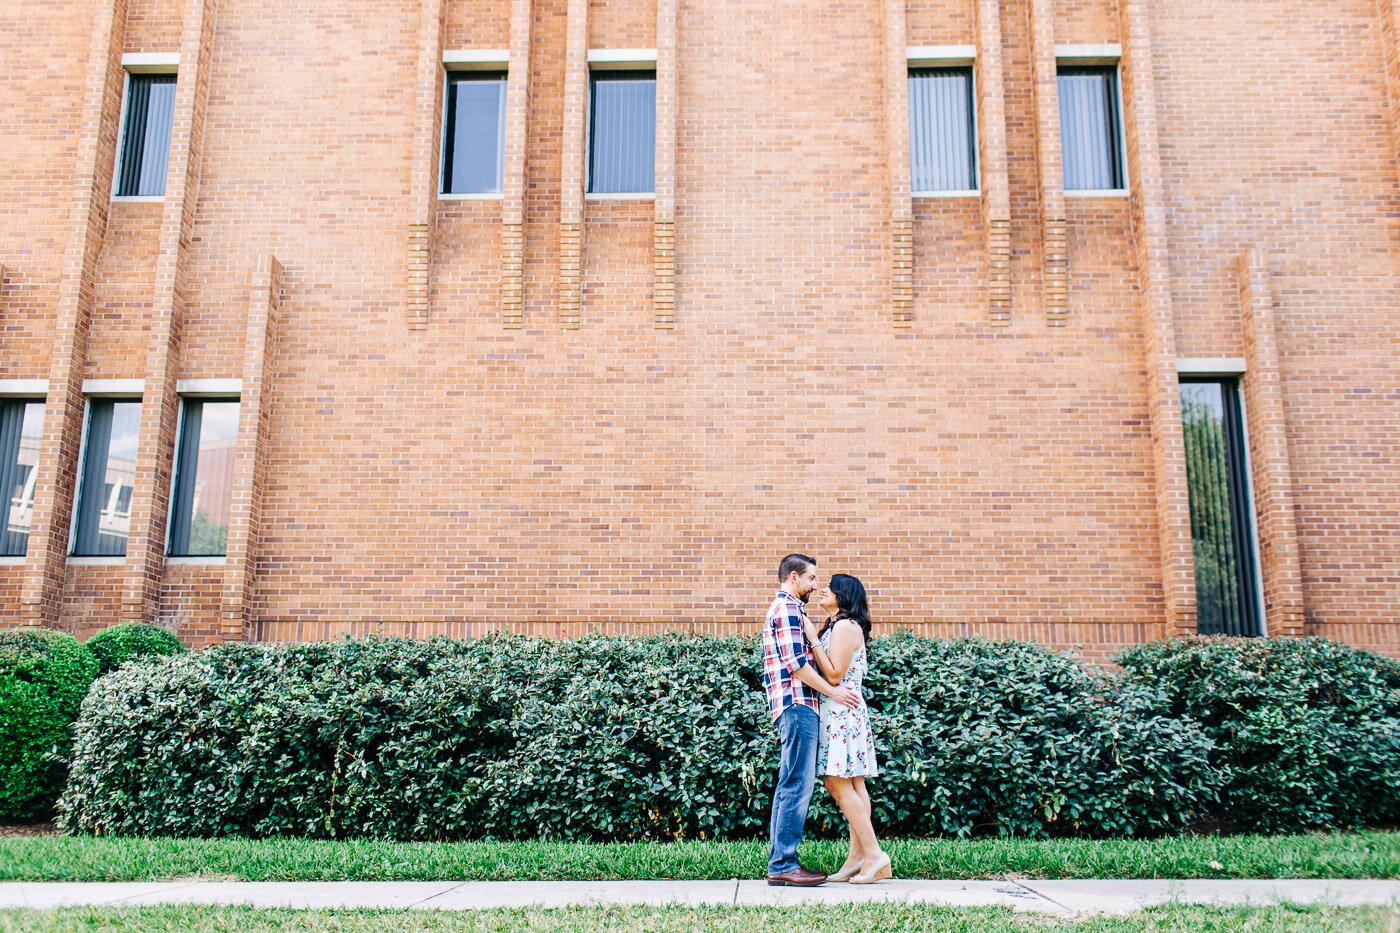 Engagement Photos at UCF